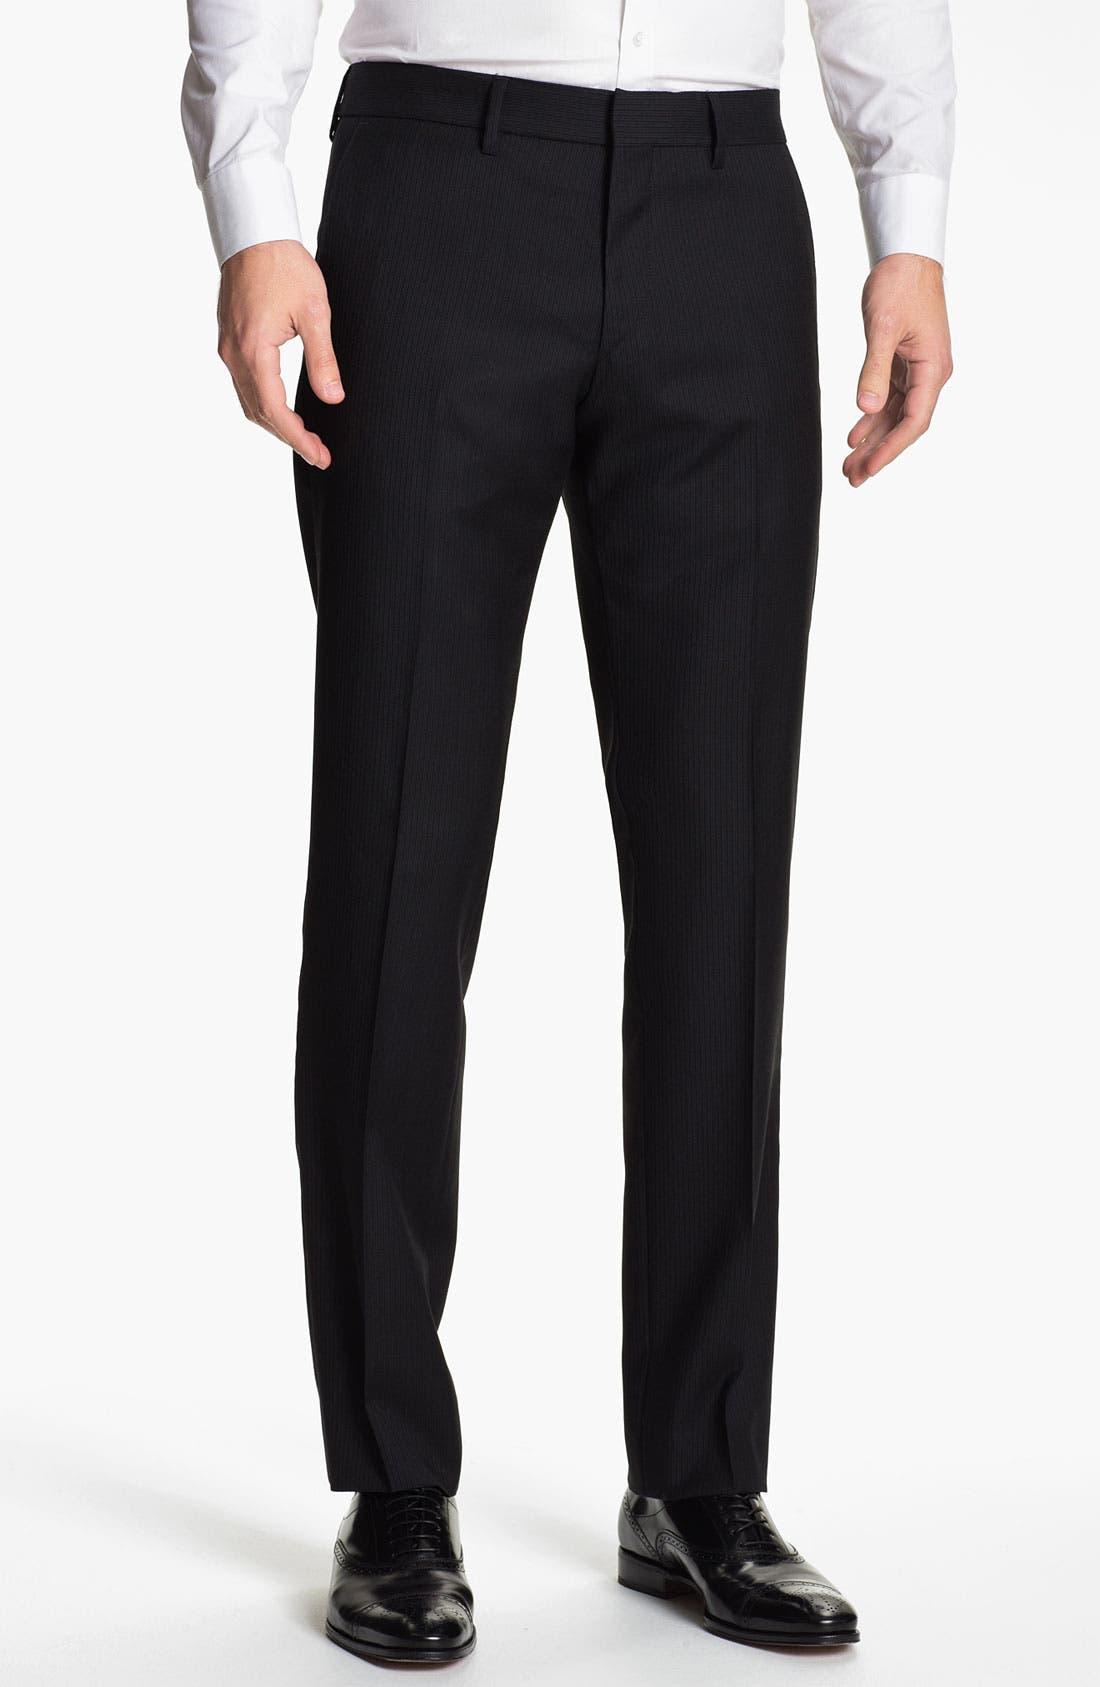 Main Image - BOSS Black 'Crigan' Pinstriped Flat Front Wool Trousers